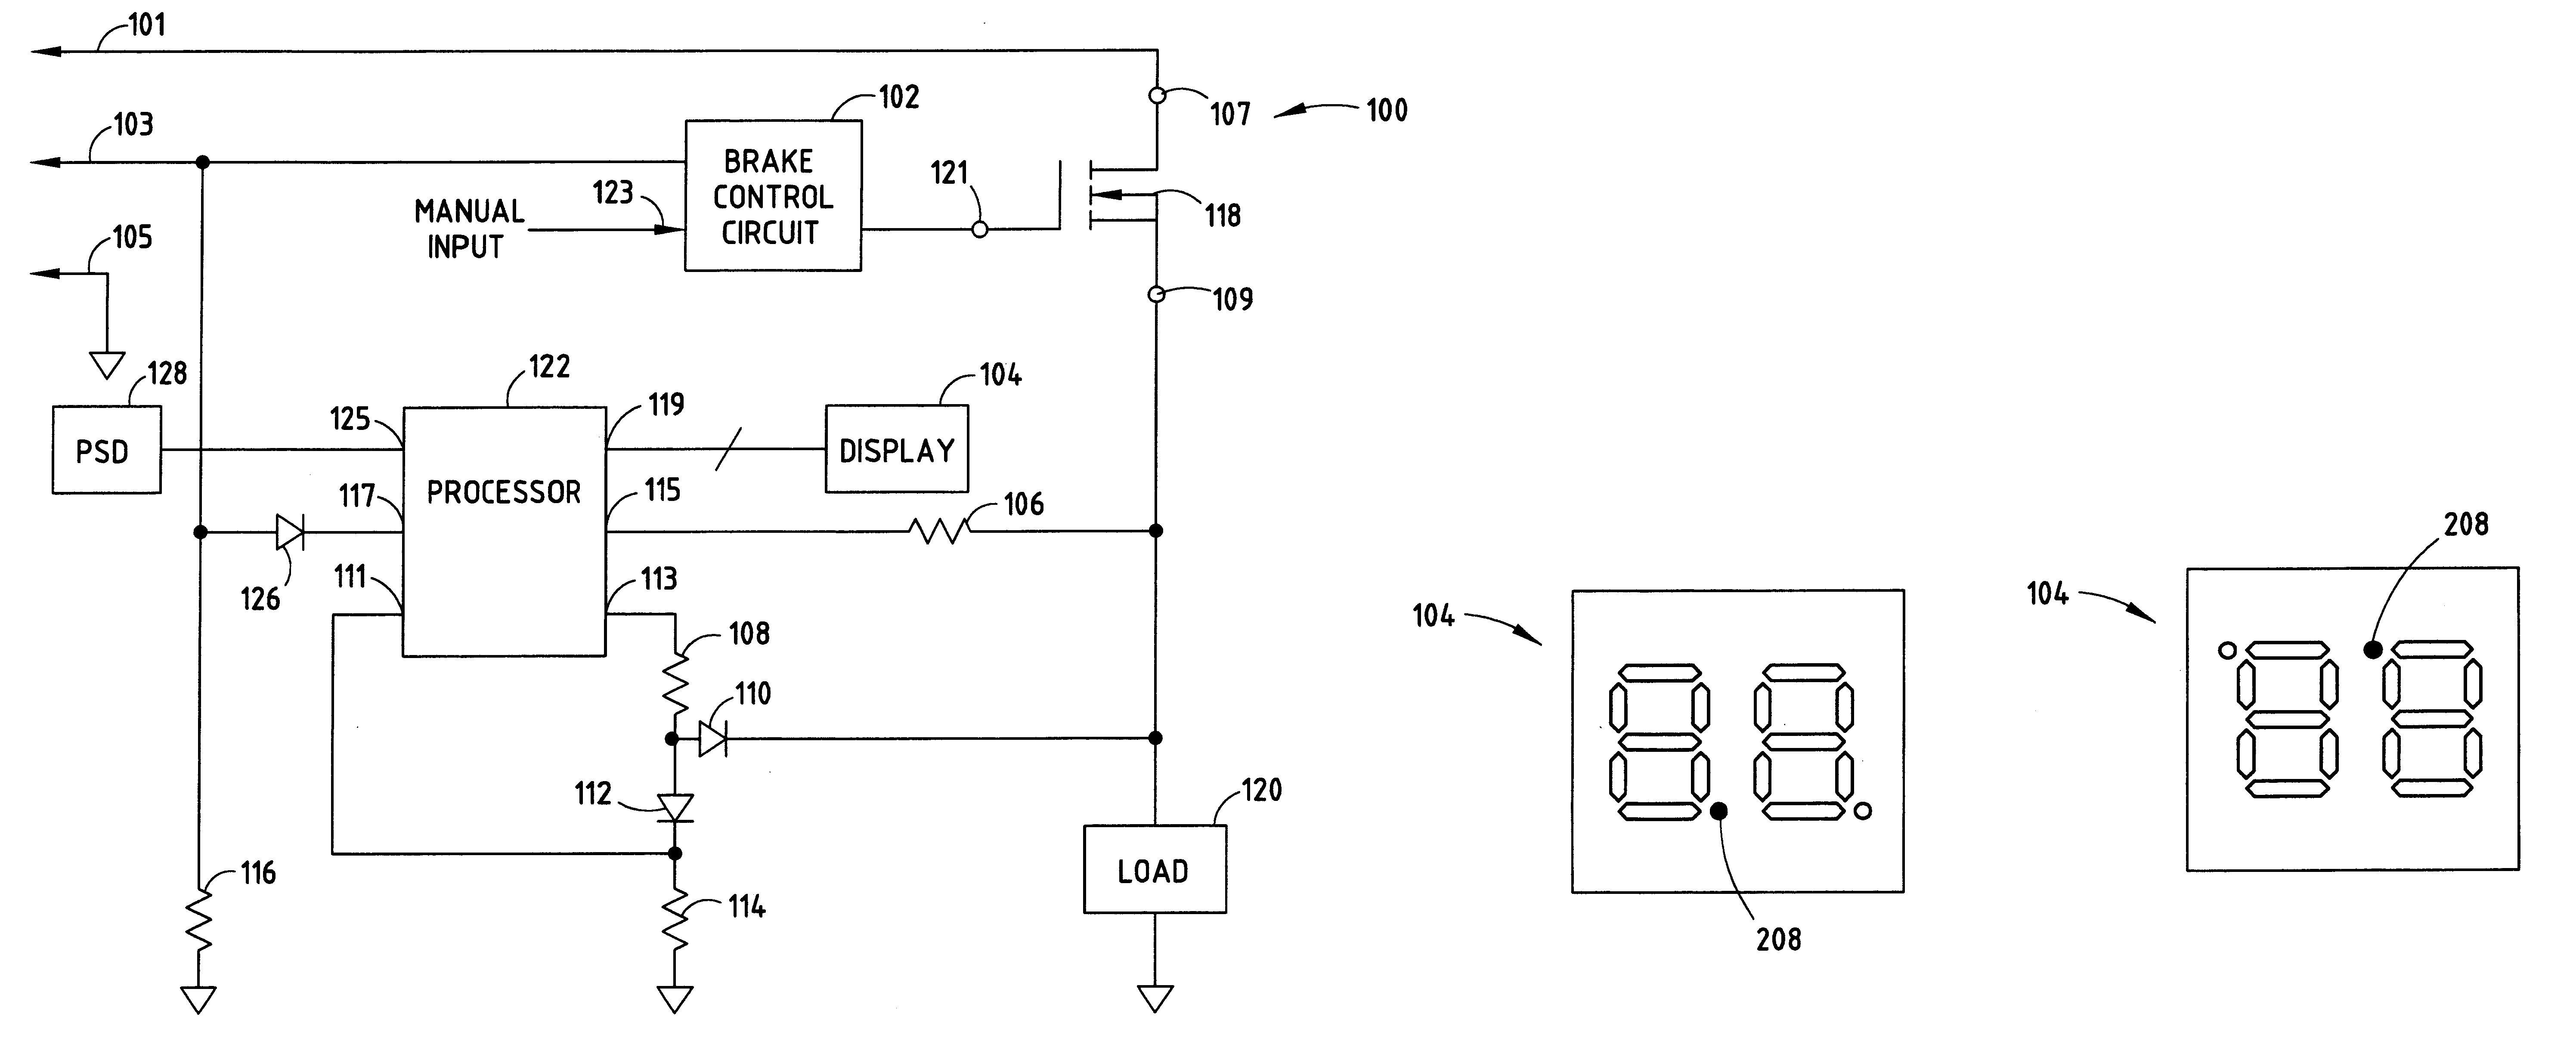 Wiring Diagrams For Utility Trailer Best Trailer Brake Controller Wiring Diagram Inspirational Utility